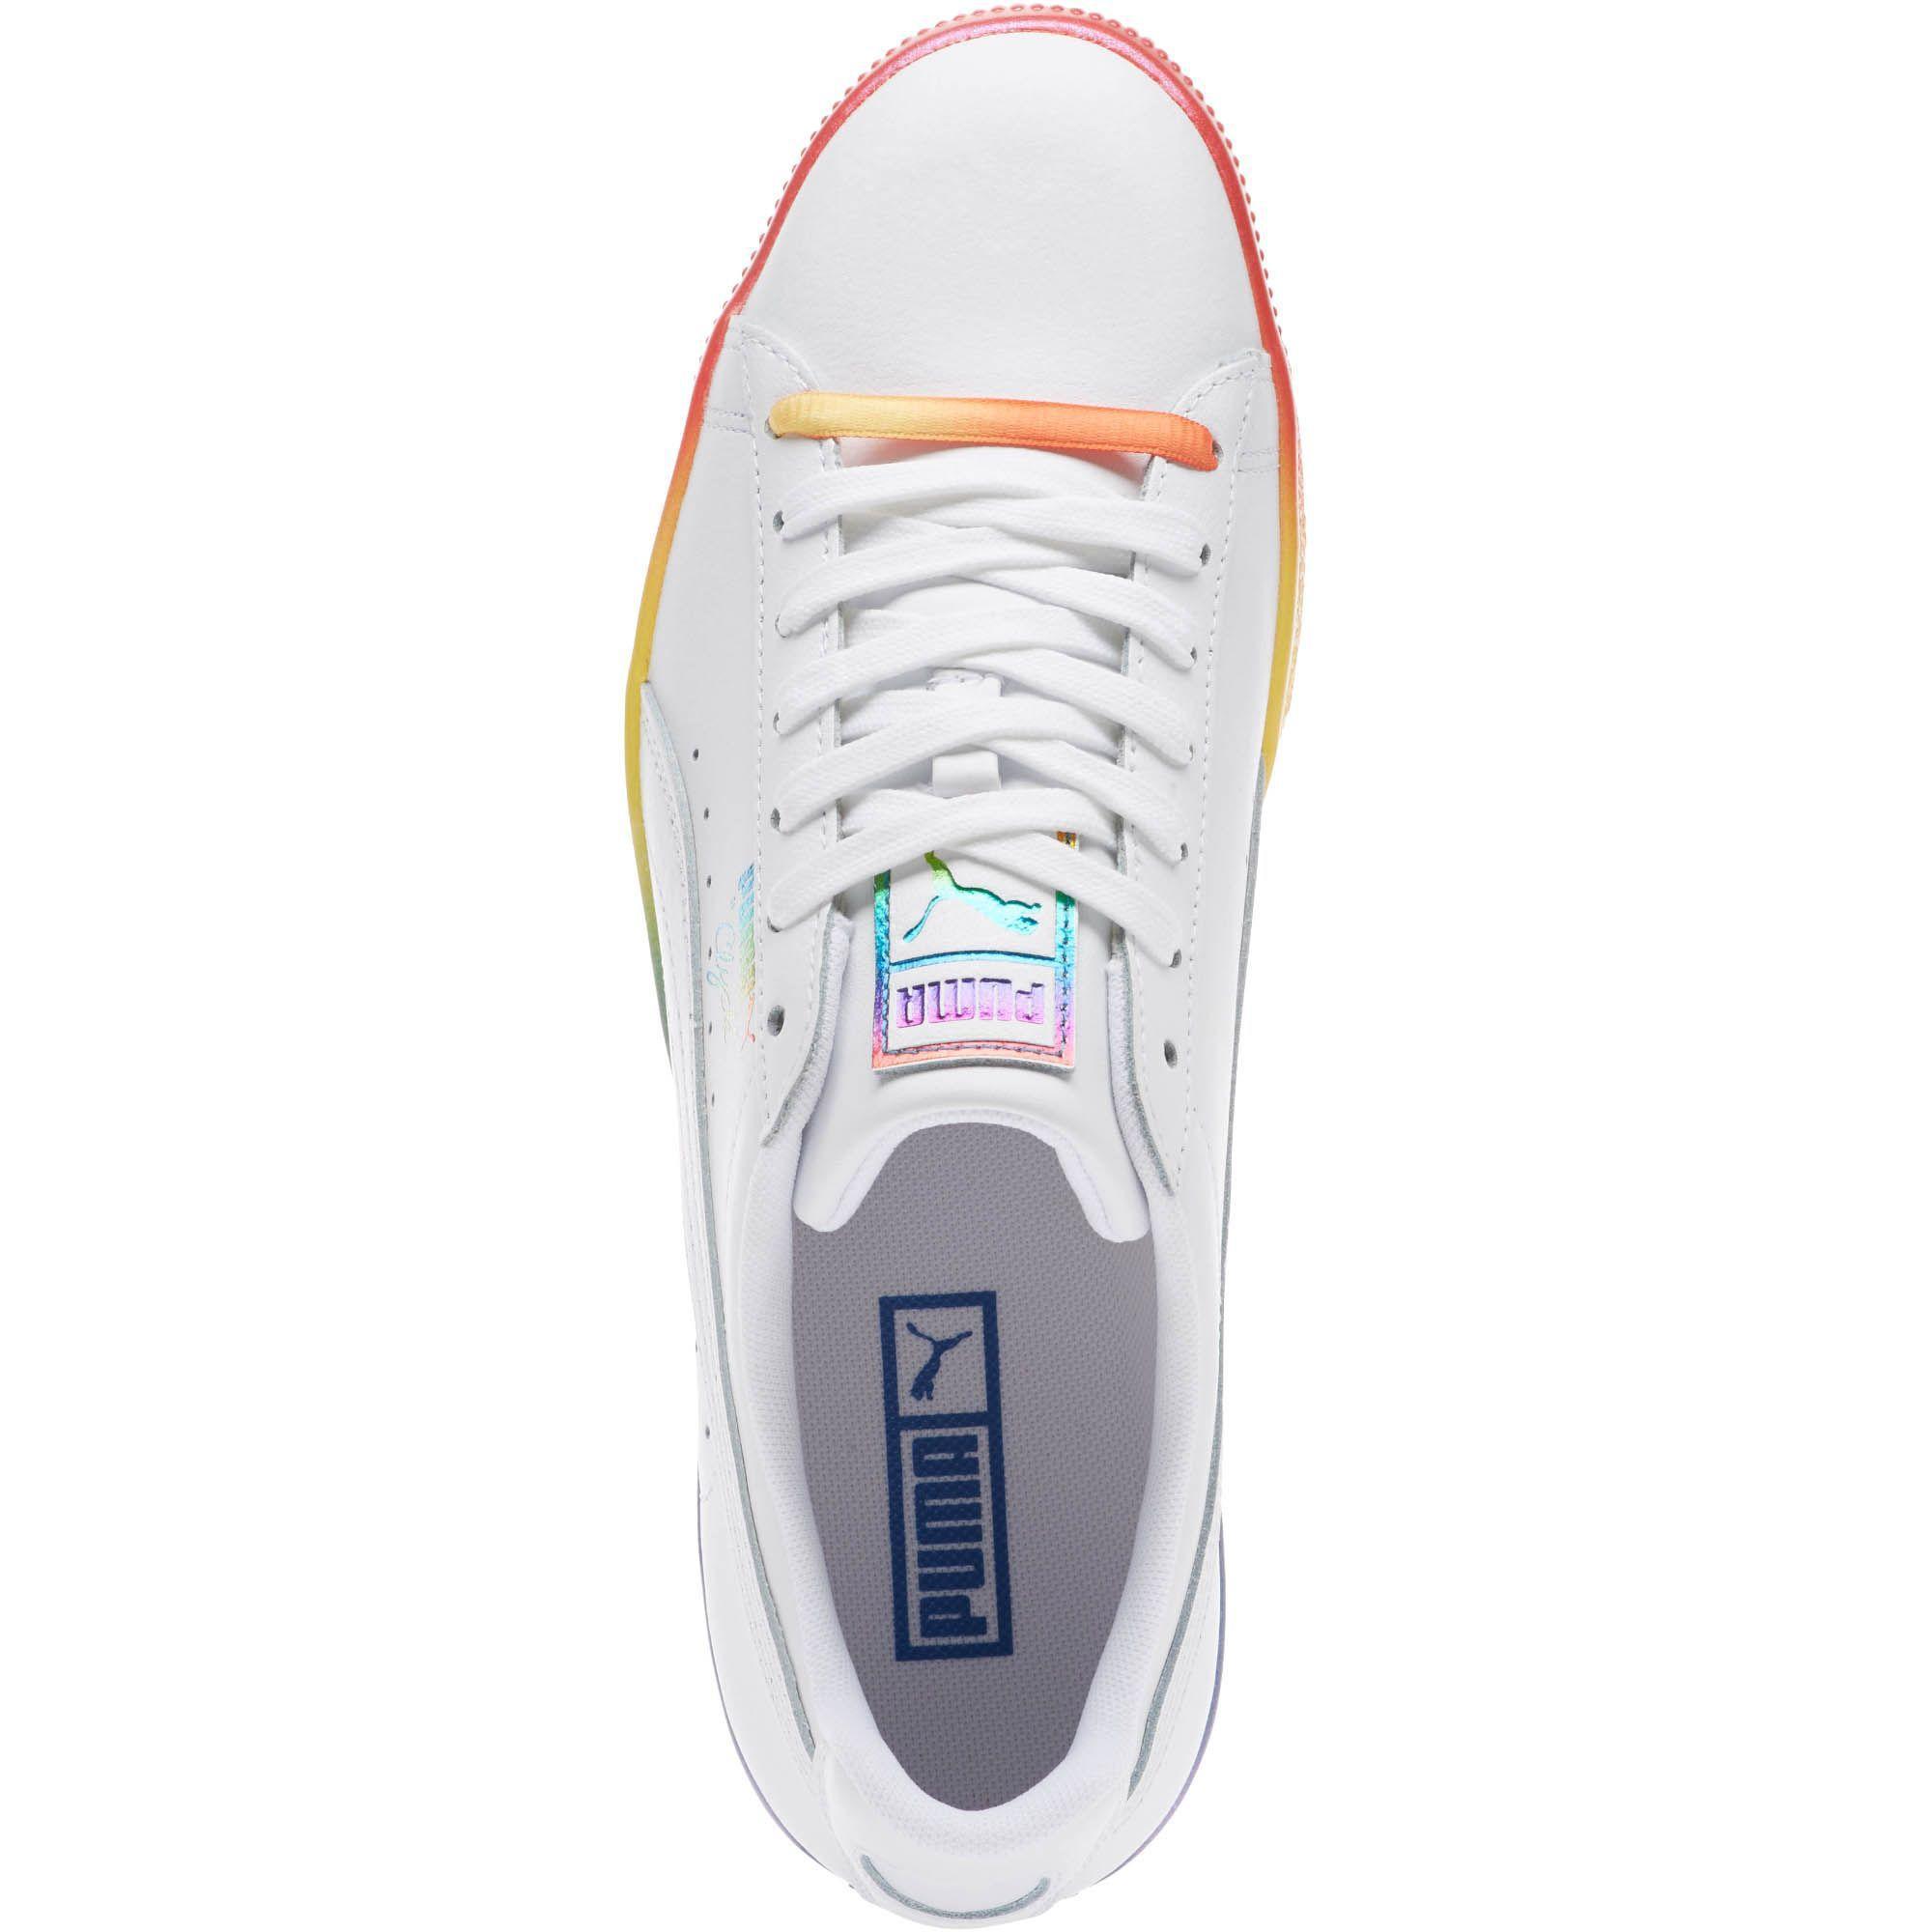 premium selection 84271 de066 PUMA White Clyde Pride Sneakers